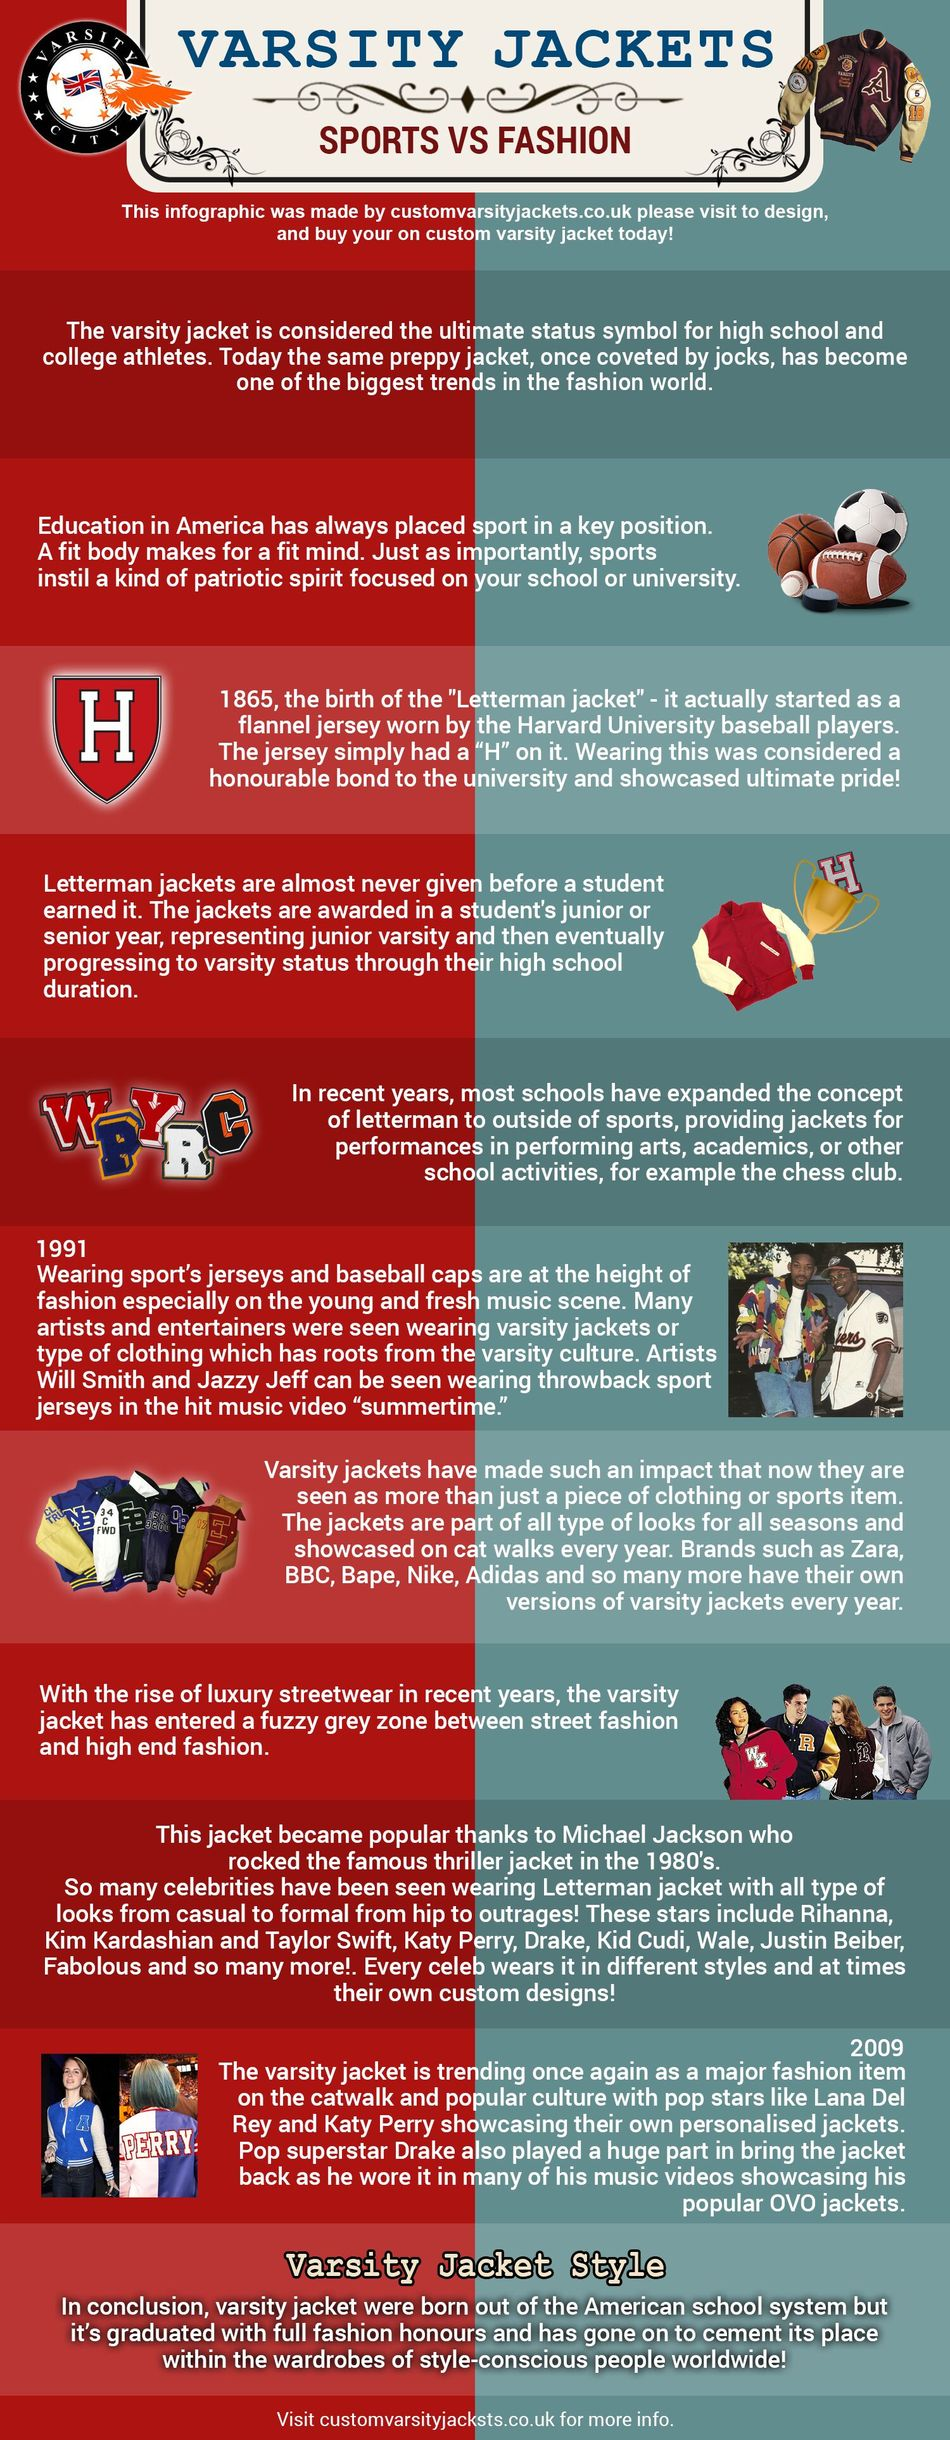 Varsity Jackets: Sports Vs Fashion